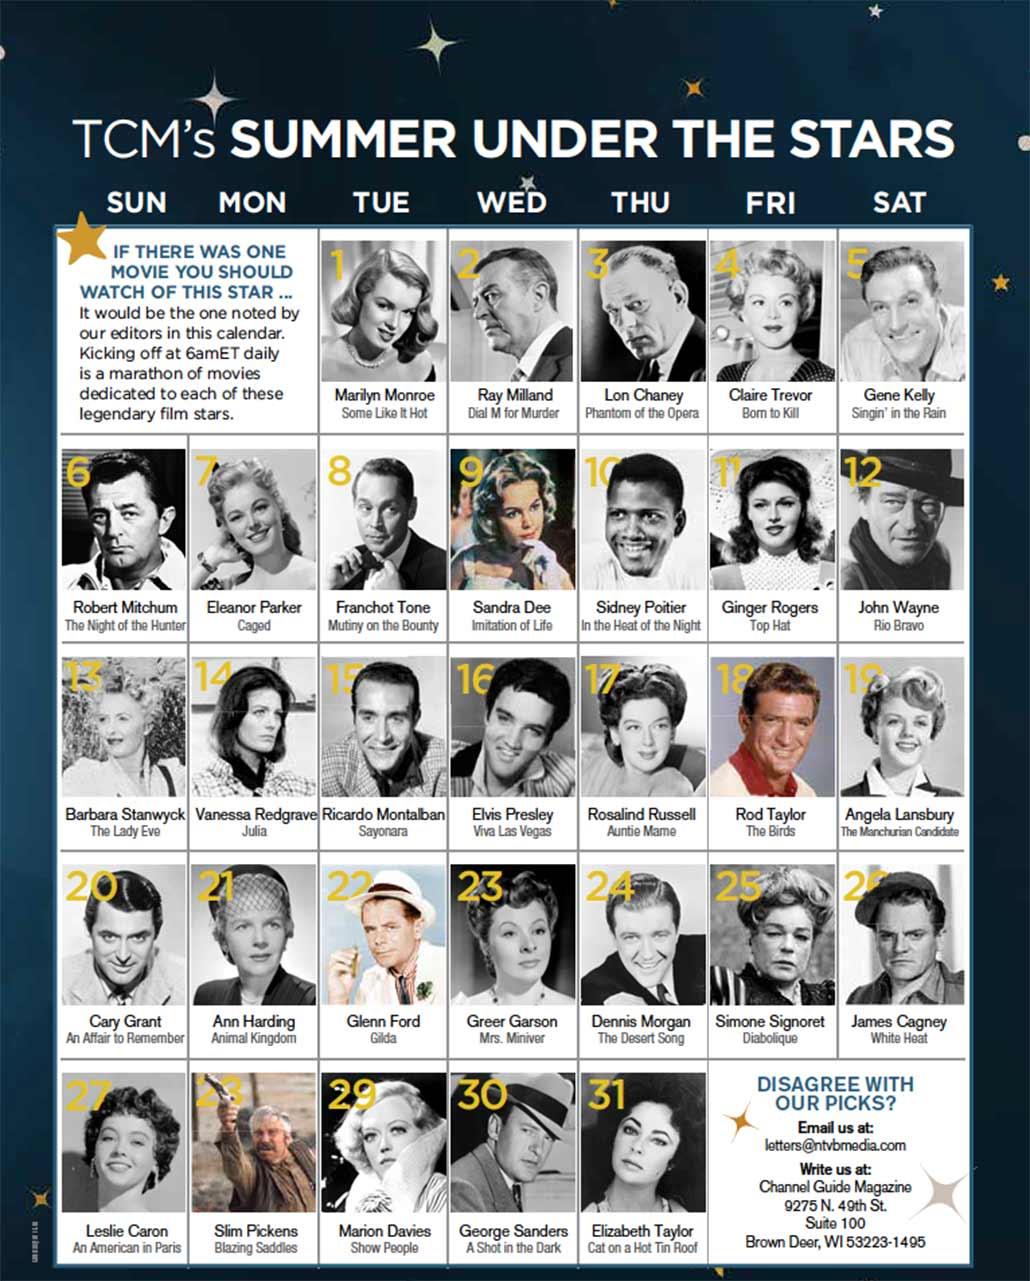 TCM Summer Under the Stars